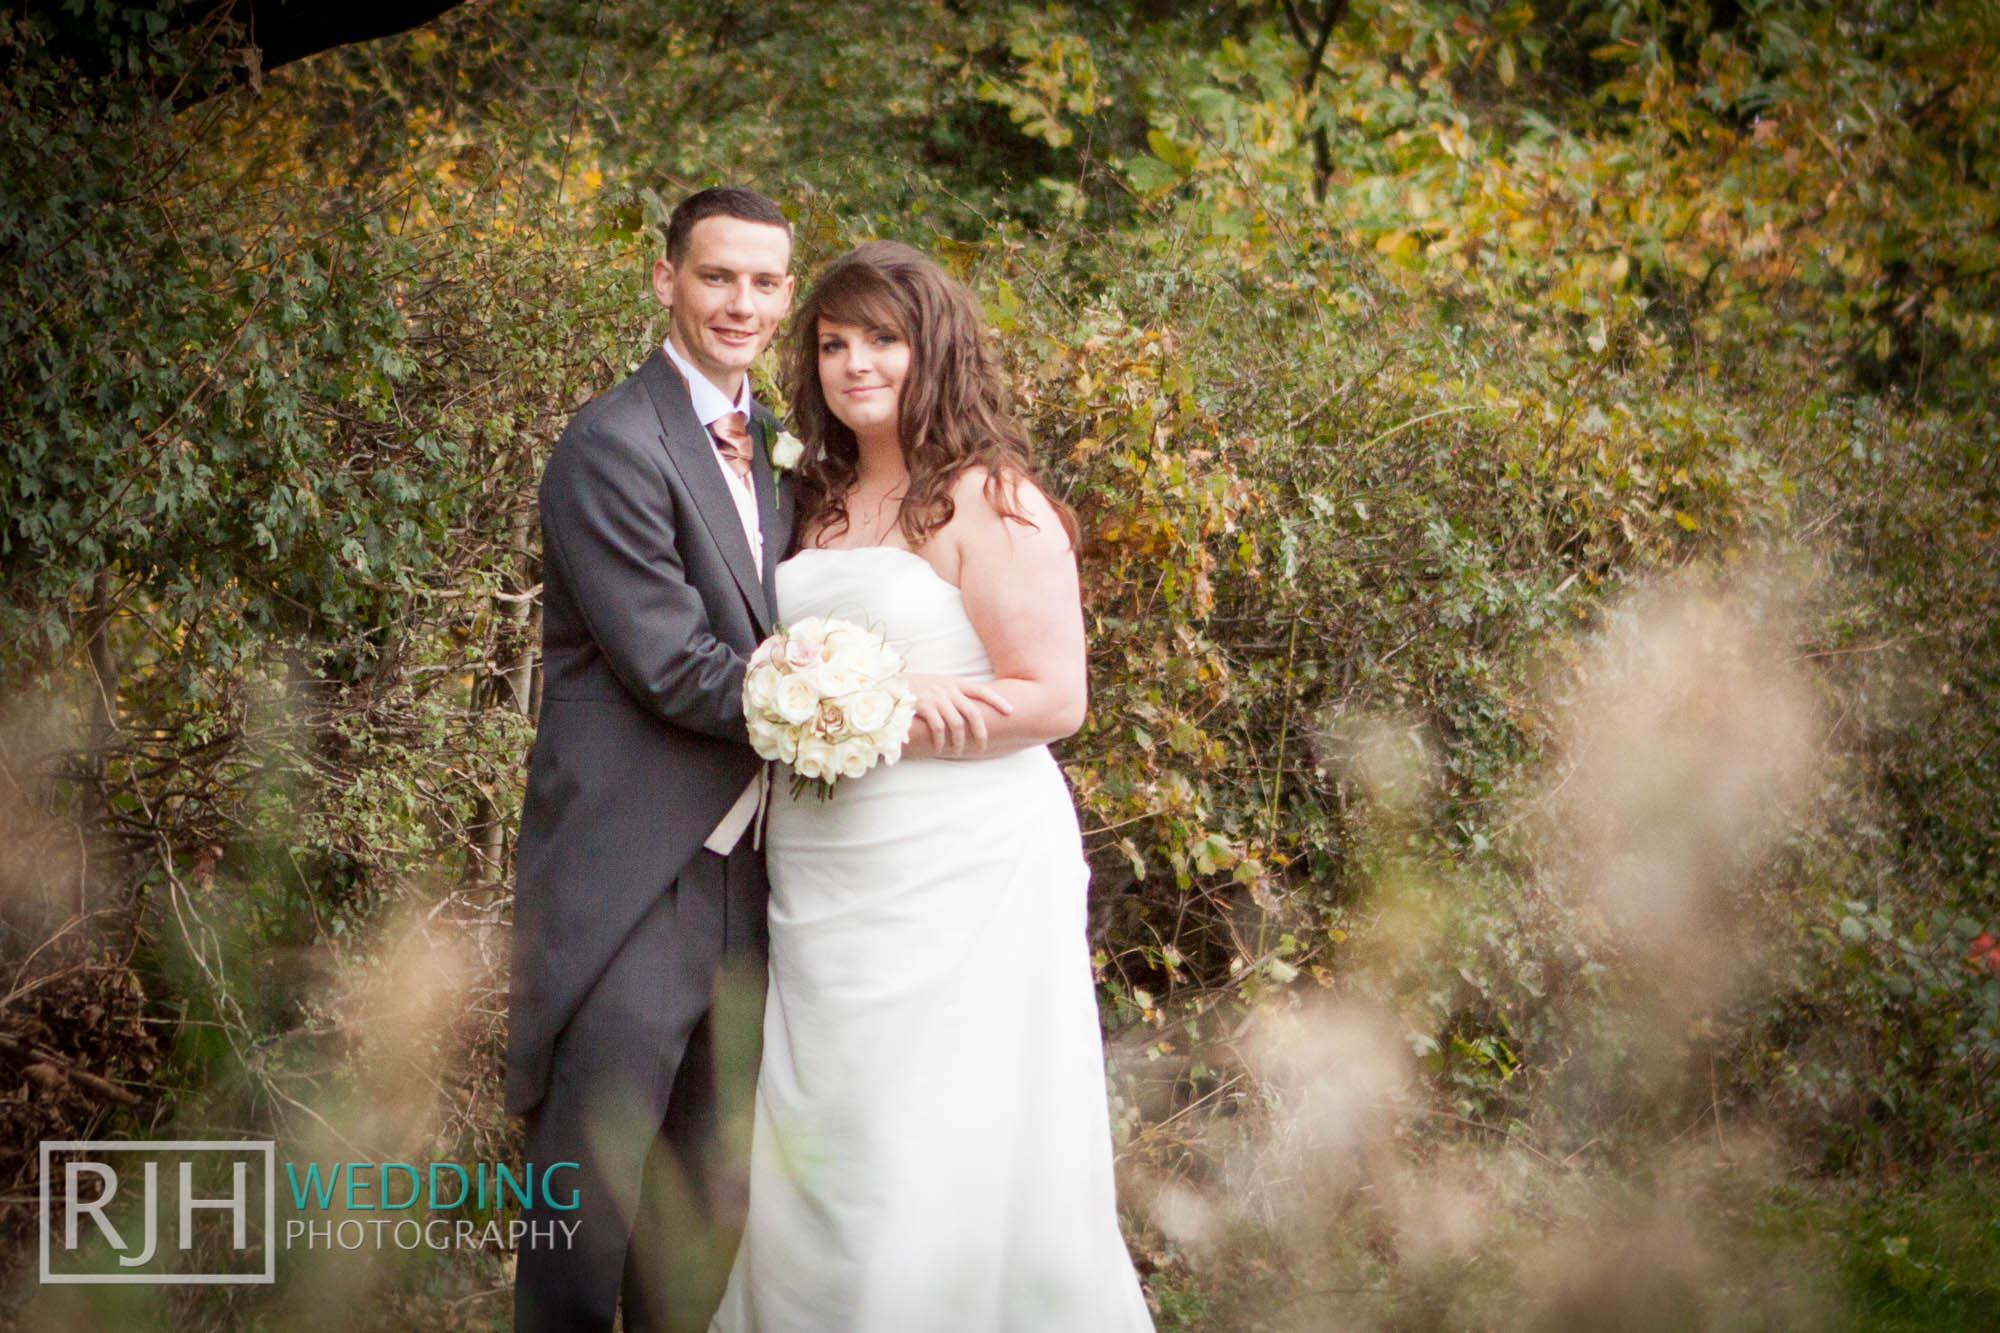 RJH Wedding Photography_2014 highlights_54.jpg